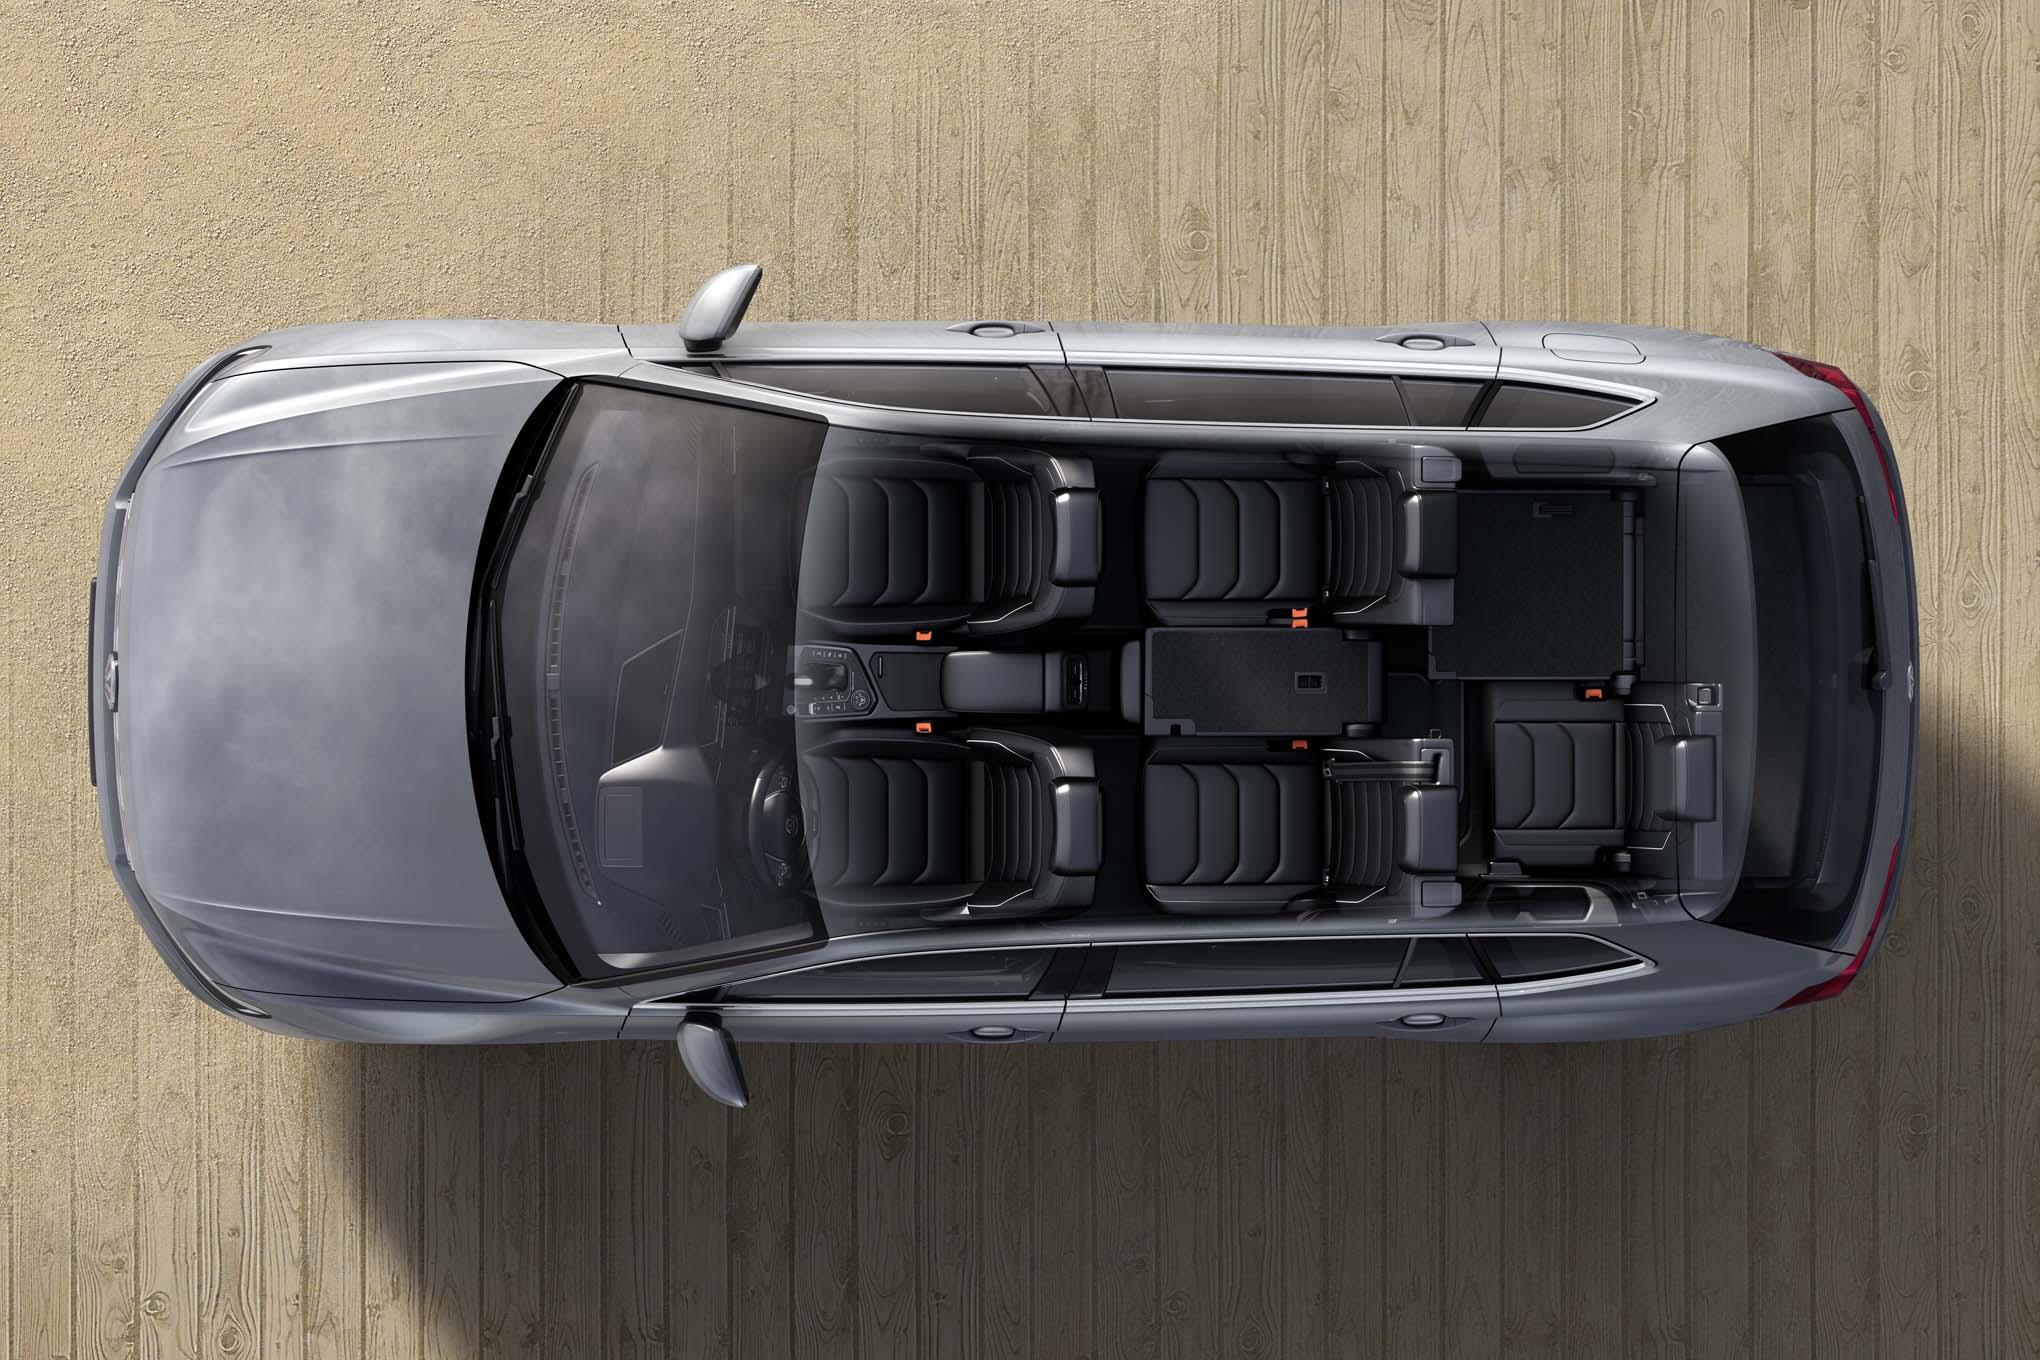 European spec Volkswagen Tiguan Allspace interior seat view